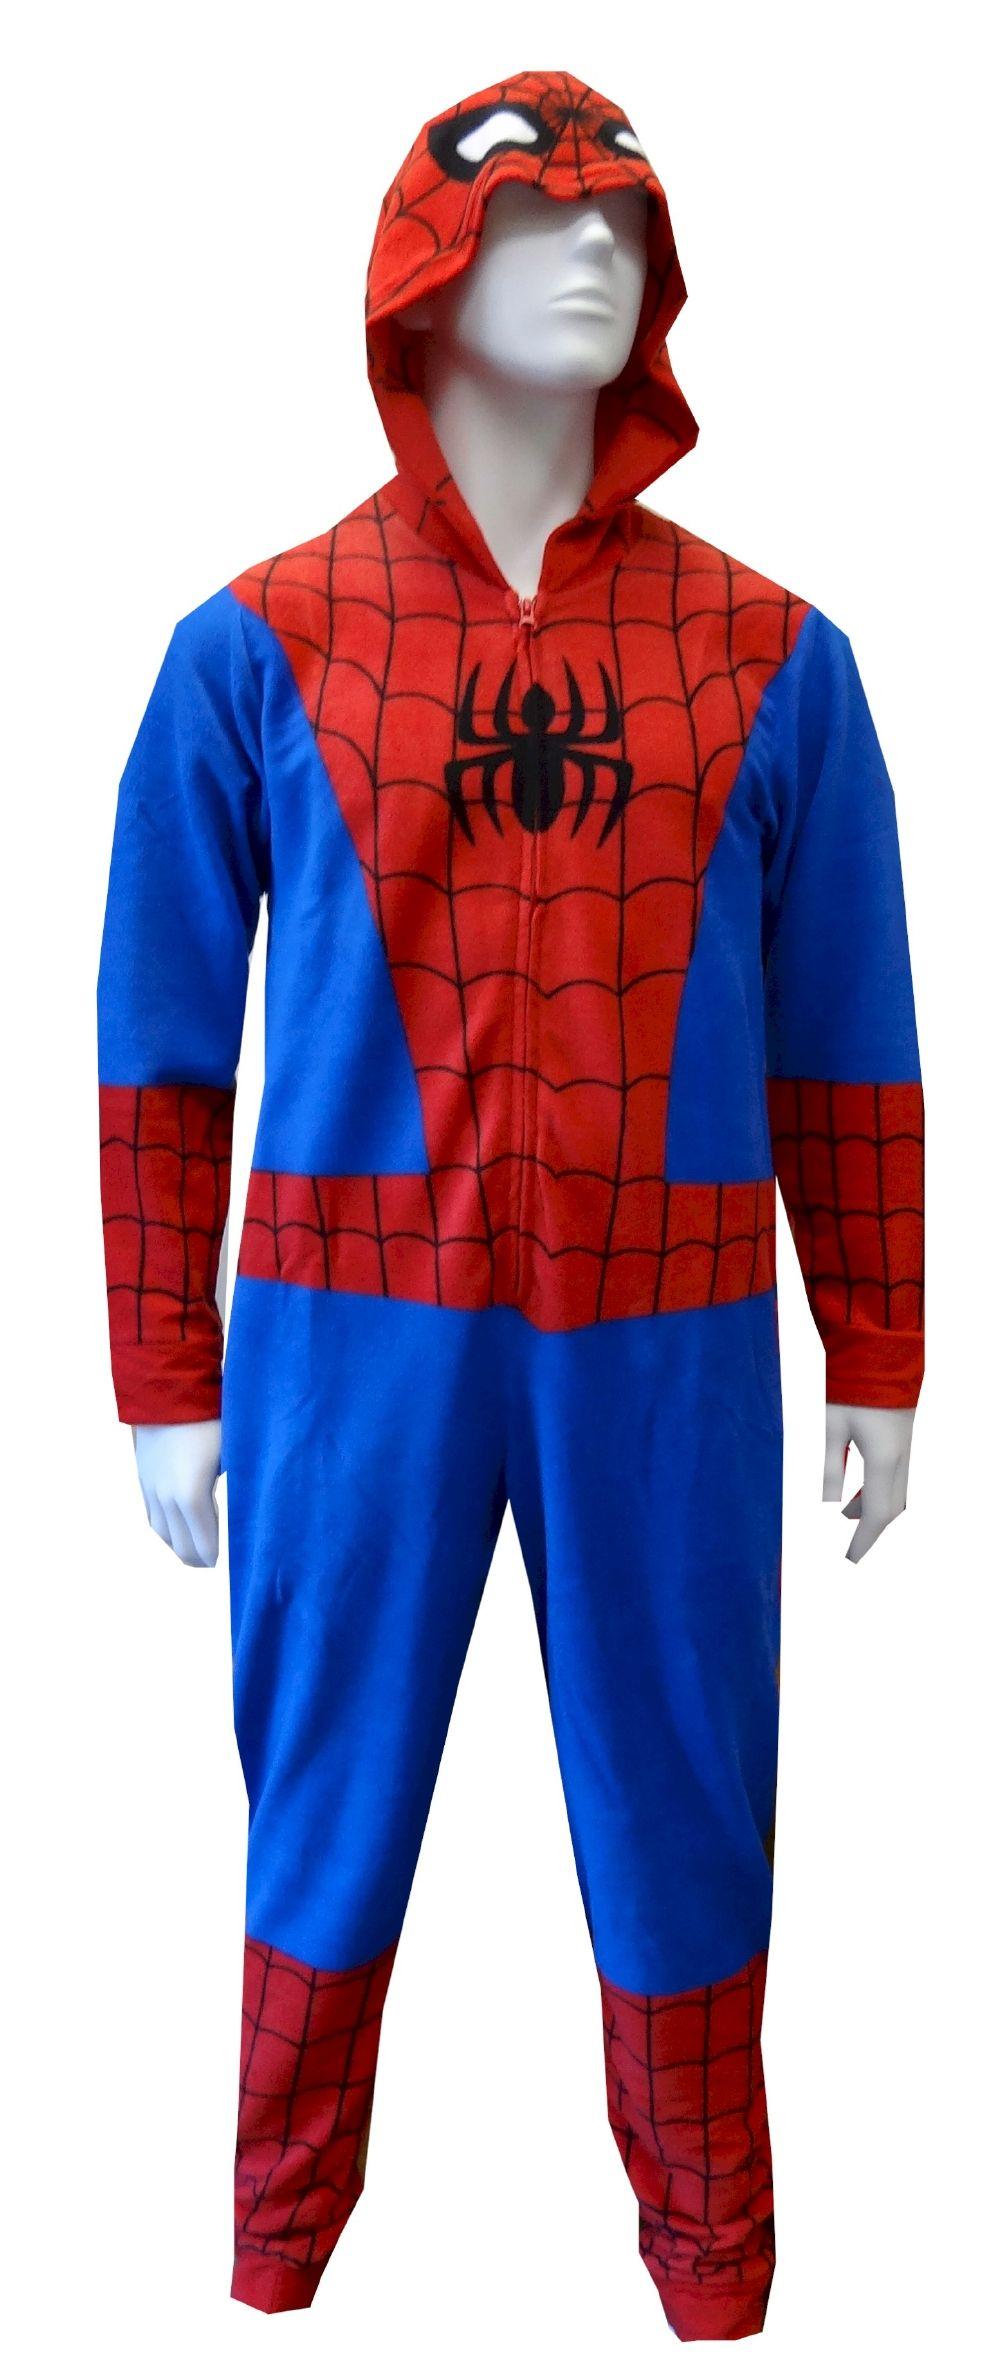 54f909e8fa59 Spiderman   Spidergirl Hooded Fleece Onesie Pajama Conquer the evil ...